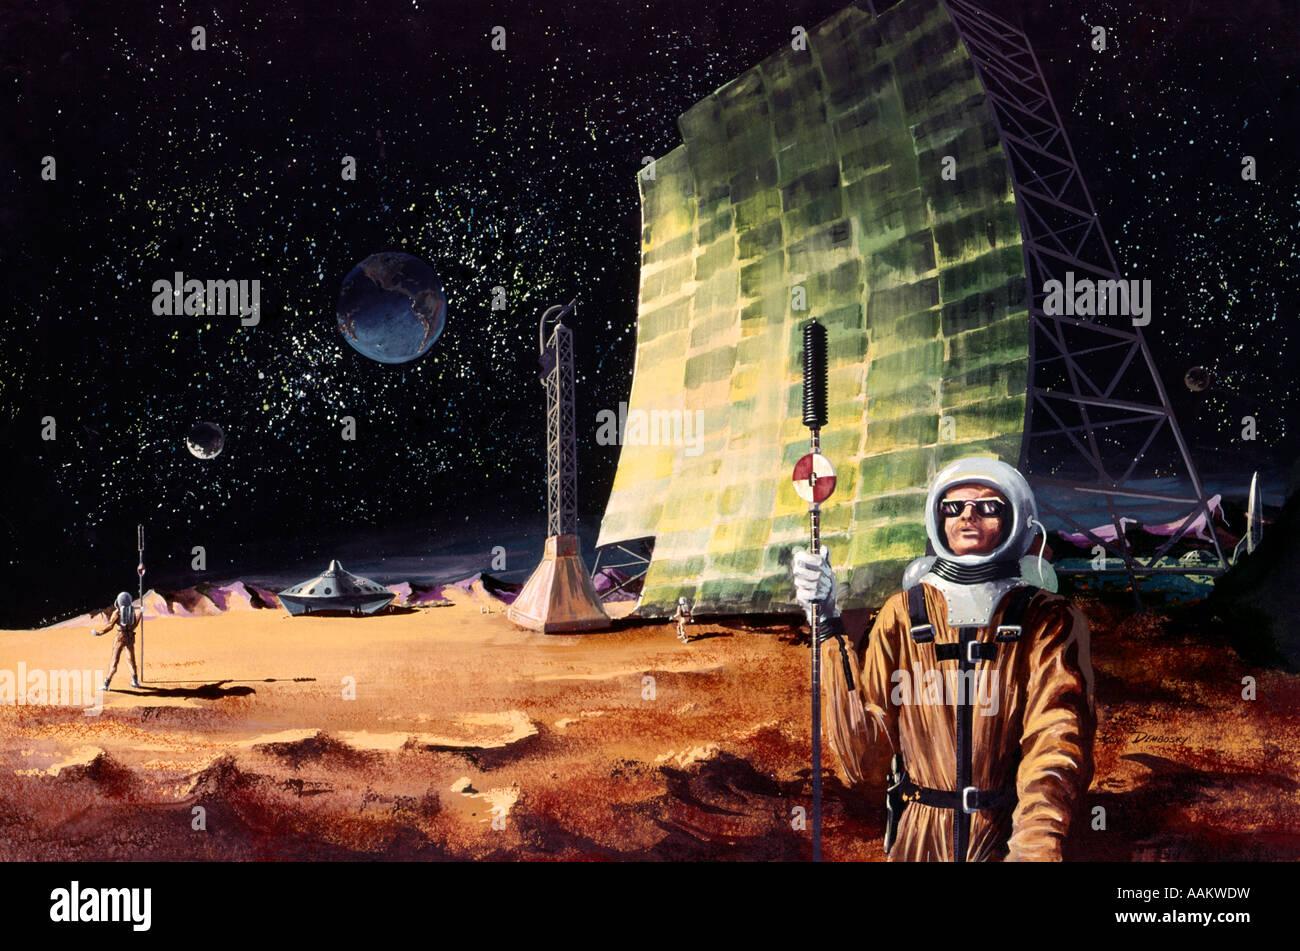 1960s ILLUSTRATION ASTRONAUTS ON EARTHS MOON SPACEMAN SURVEYORS EXPLORERS SCI-FI SCIENCE FICTION FANTASY - Stock Image